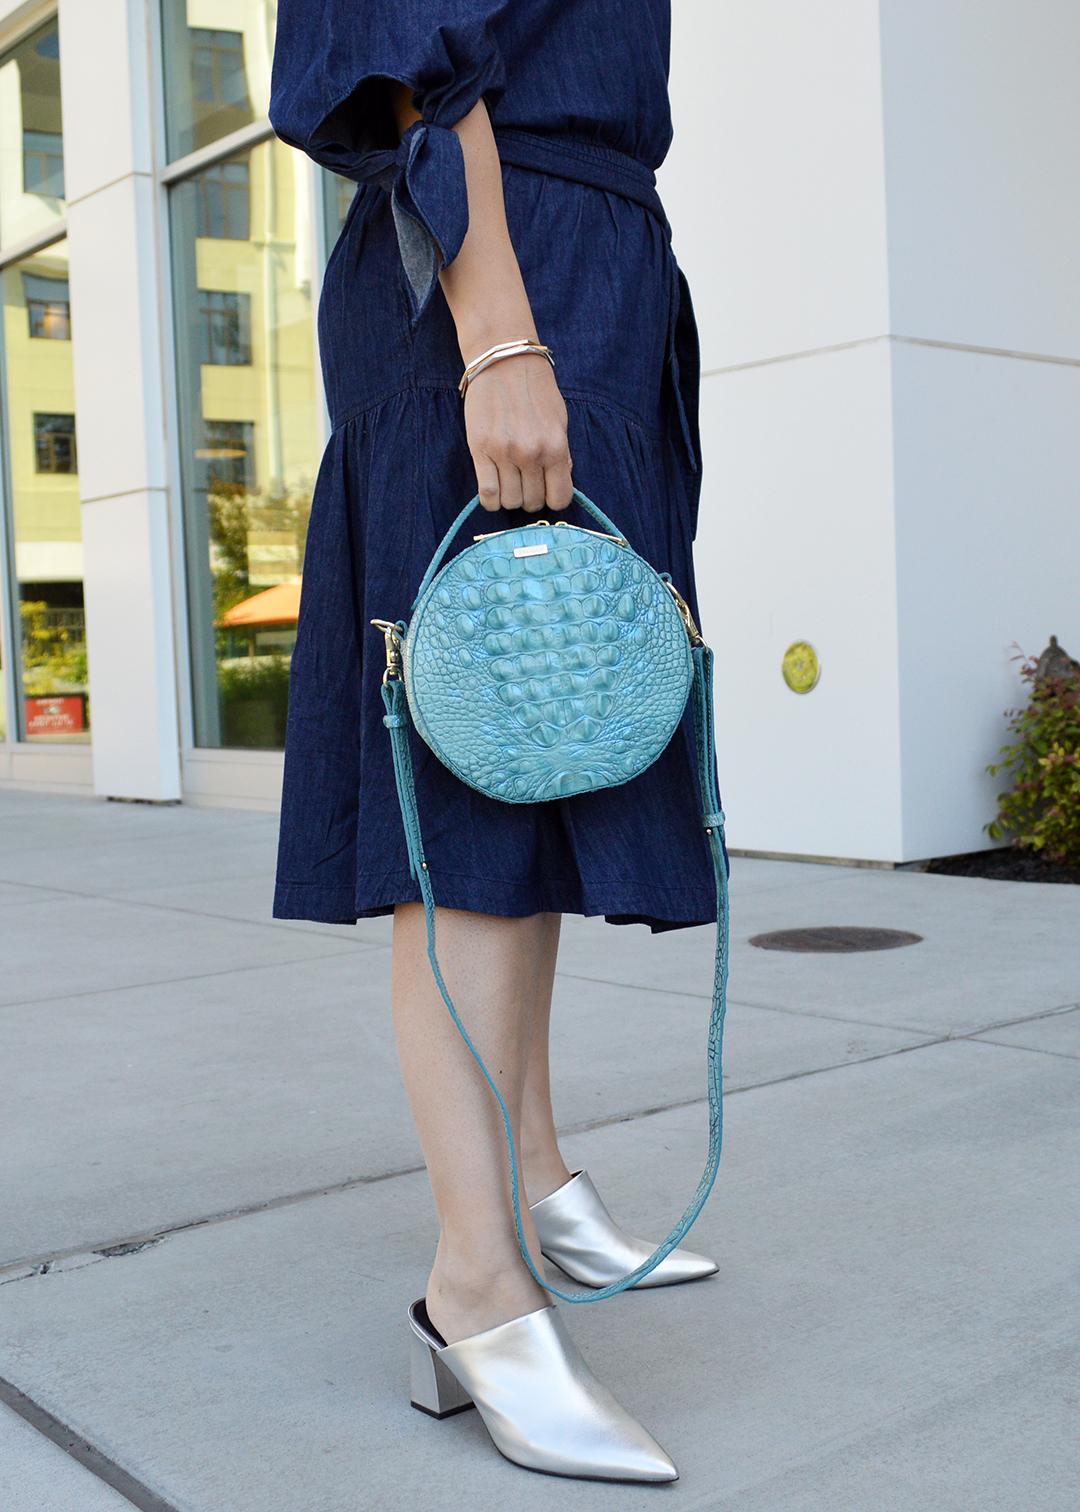 circle bag trend summer 2018